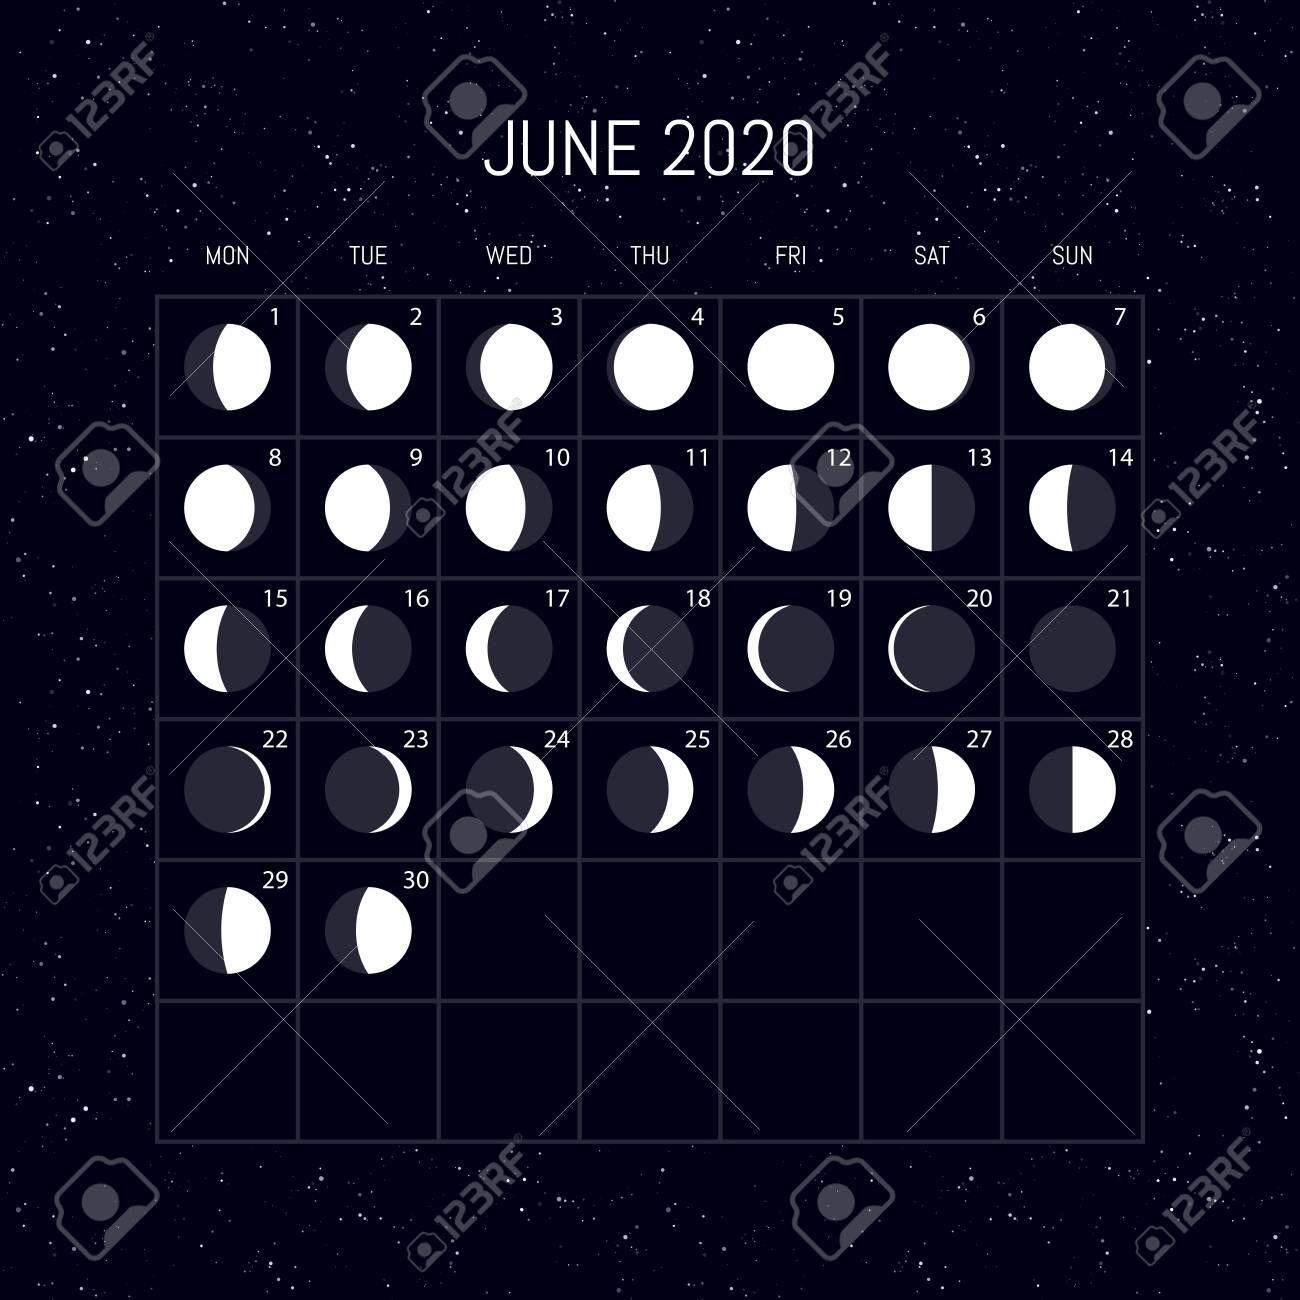 Moon Calendar June 2020 In 2020 | Moon Calendar Moon Phase